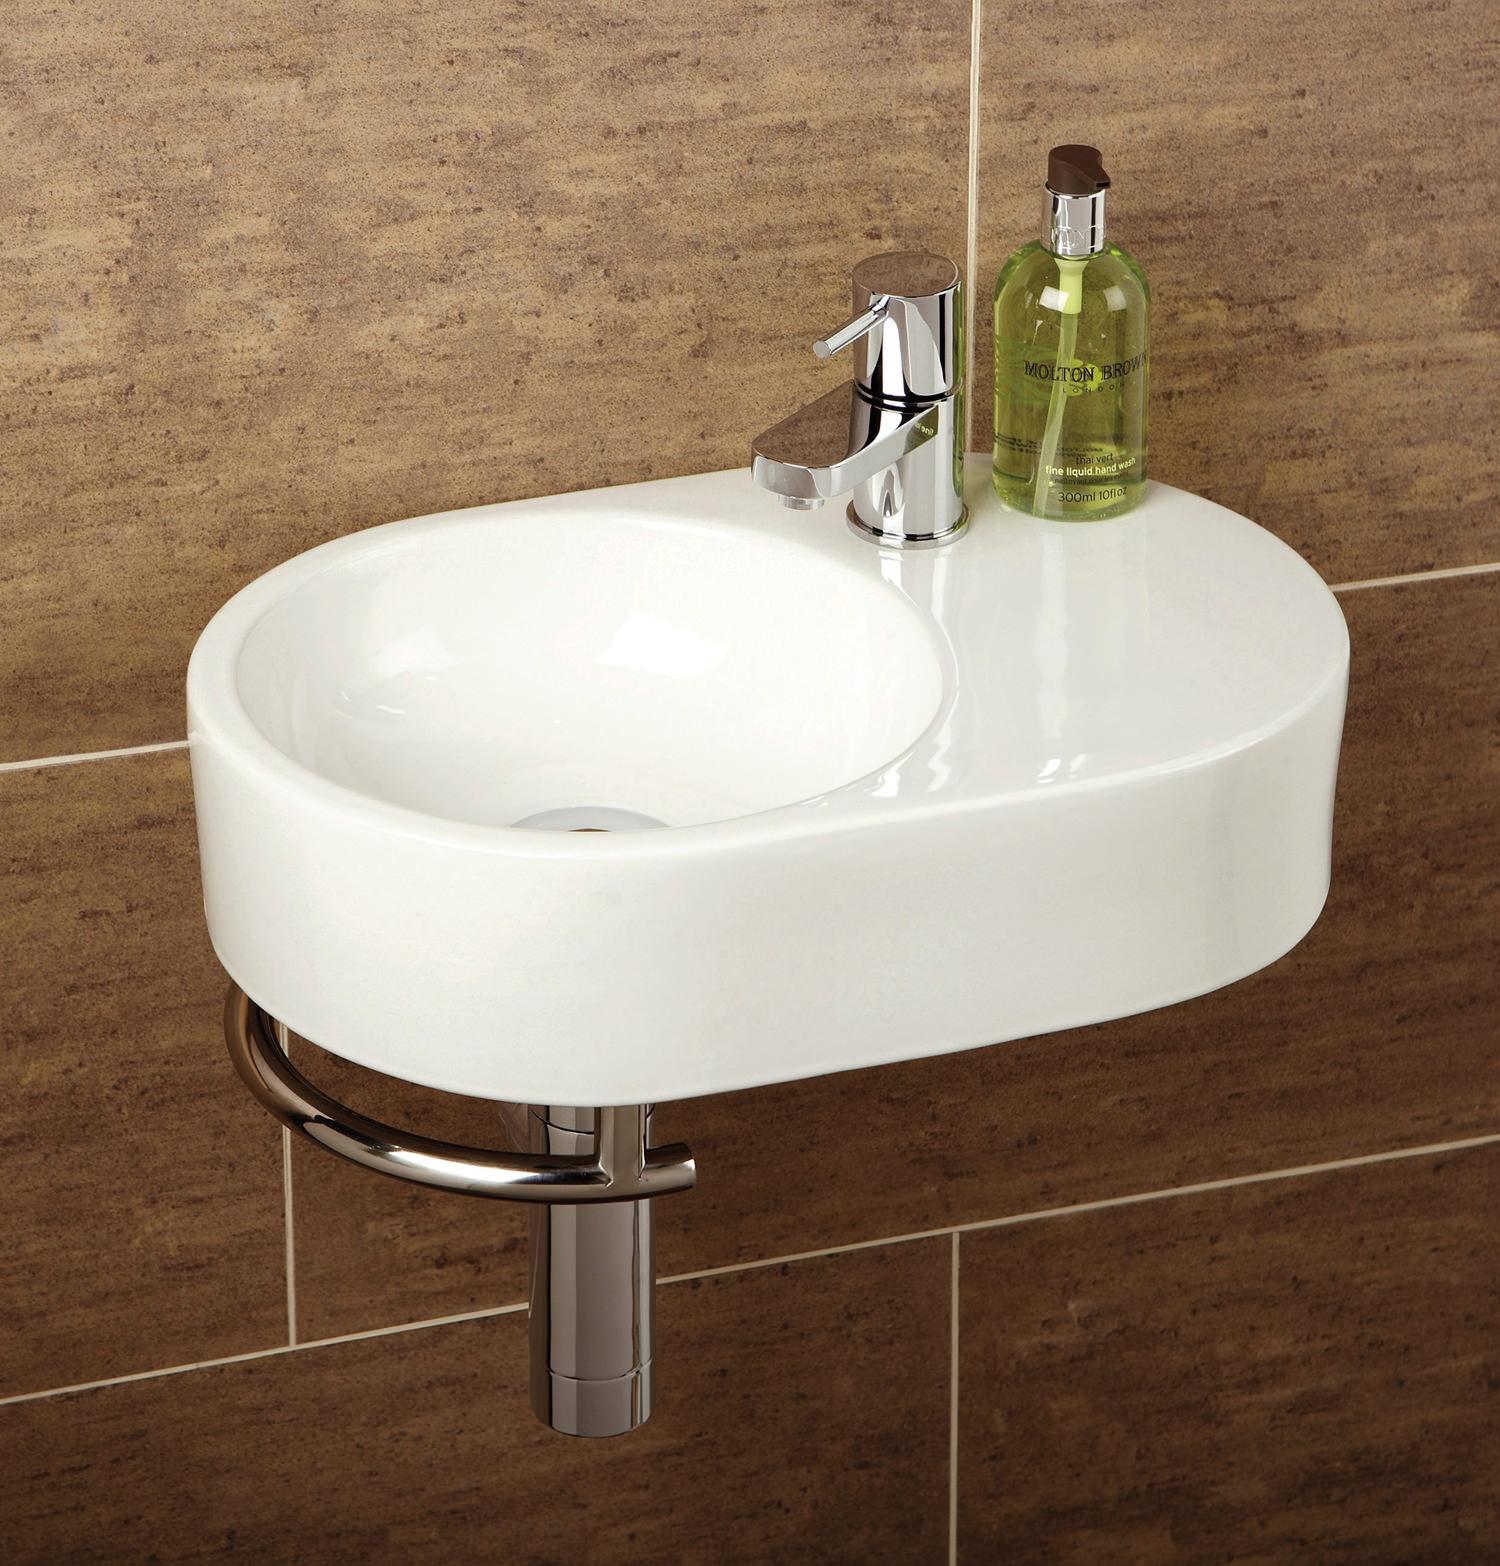 HIB Malo Saville Cloakroom Basin With Towel Rail